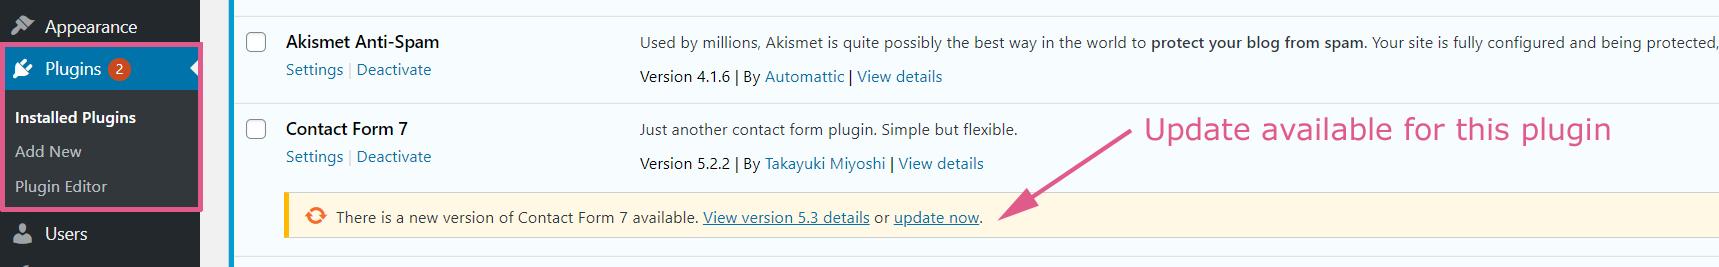 Installing WordPress Plugin Updates